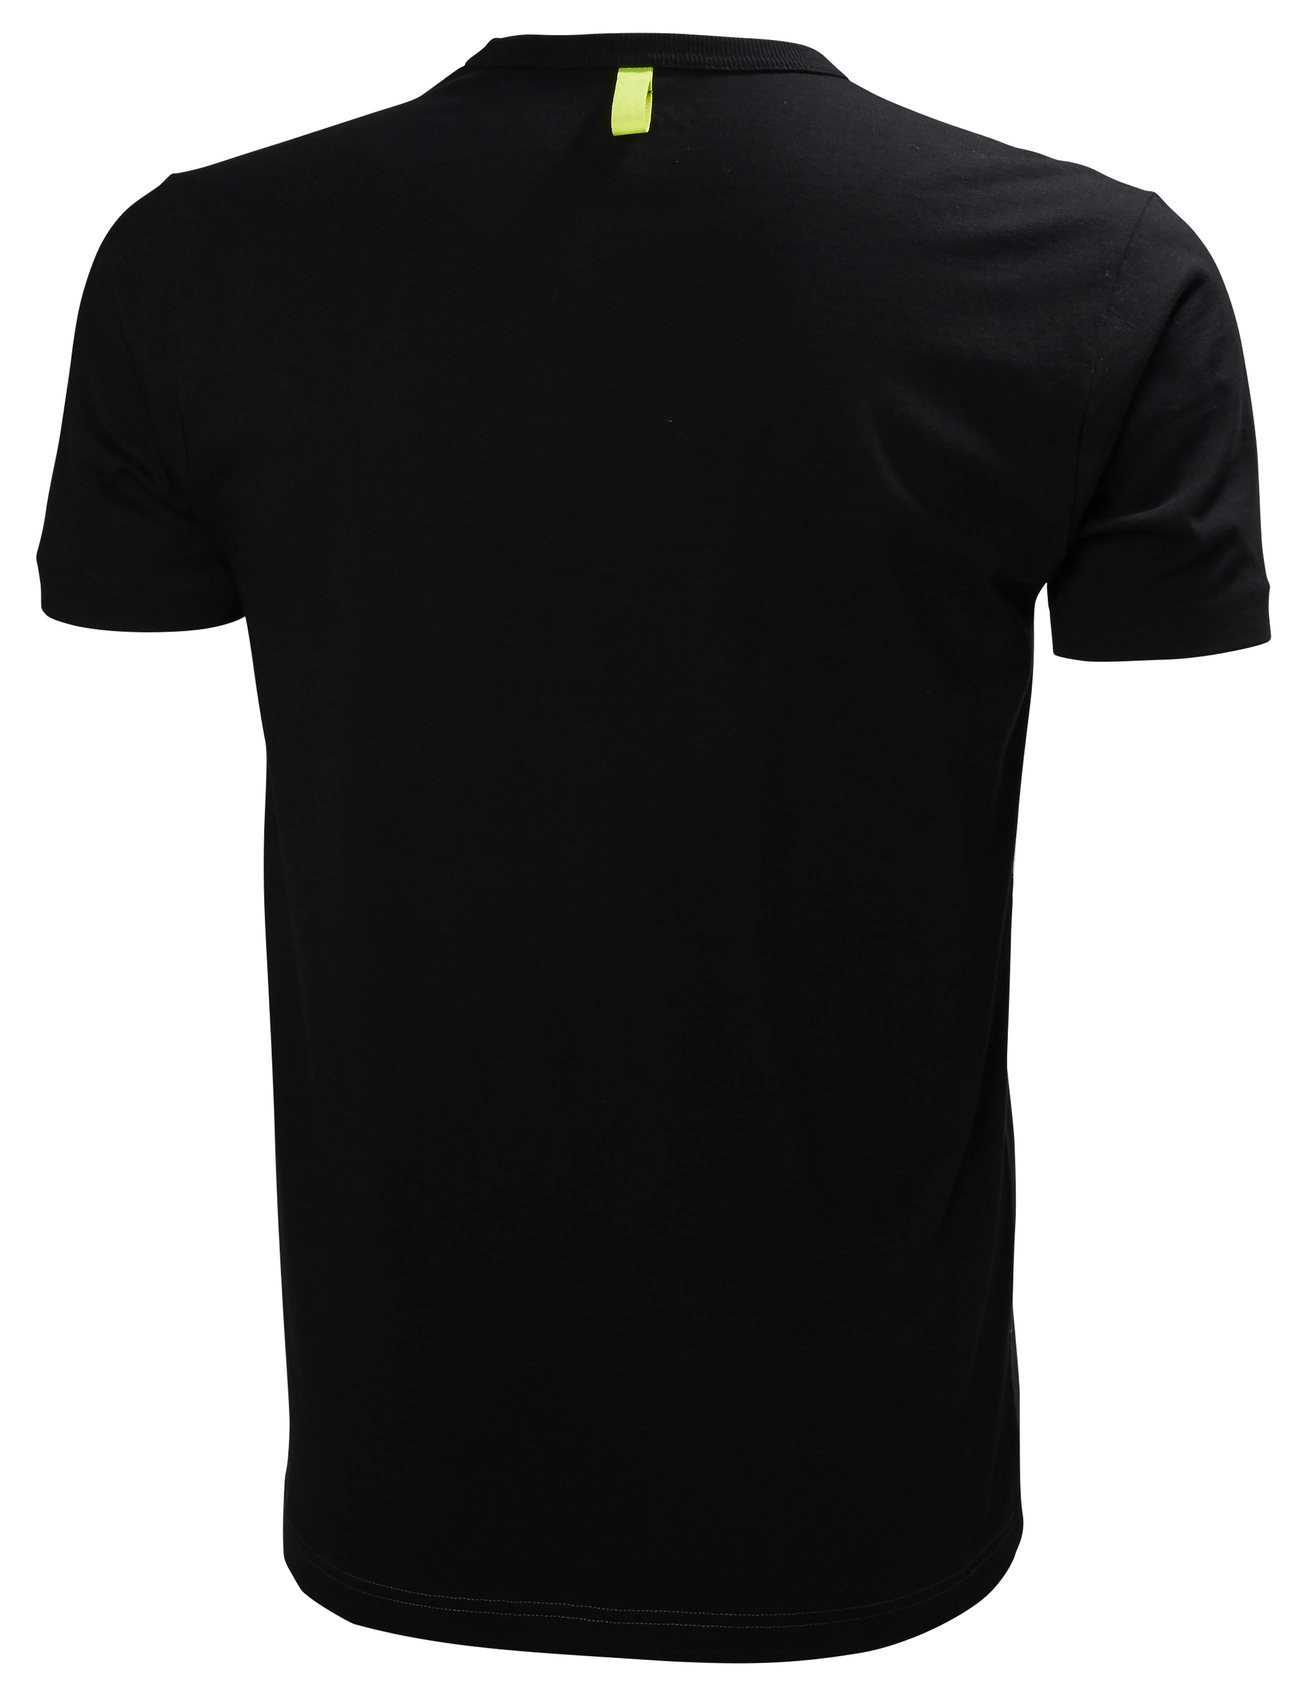 Футболка Helly Hansen Aker Tee - 79160 (Black; M)